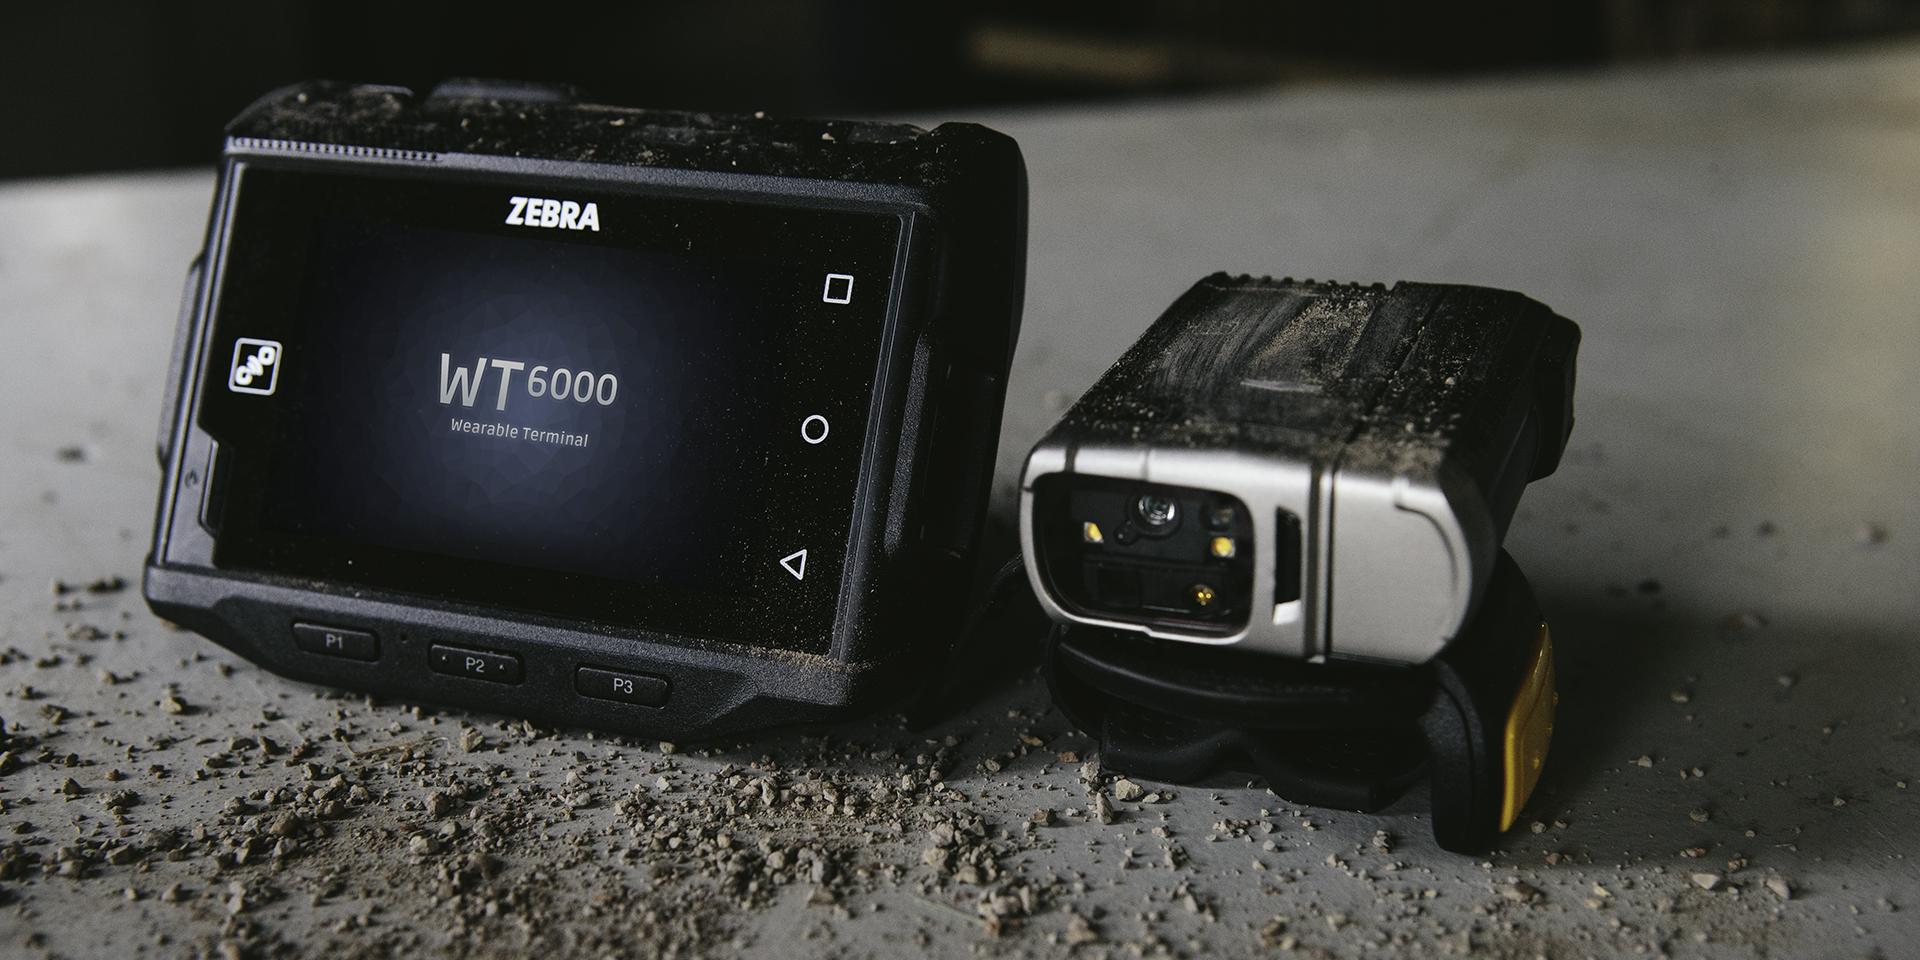 Zebra RS6000 2D Ringscanner - Details und Datenblatt | identWERK